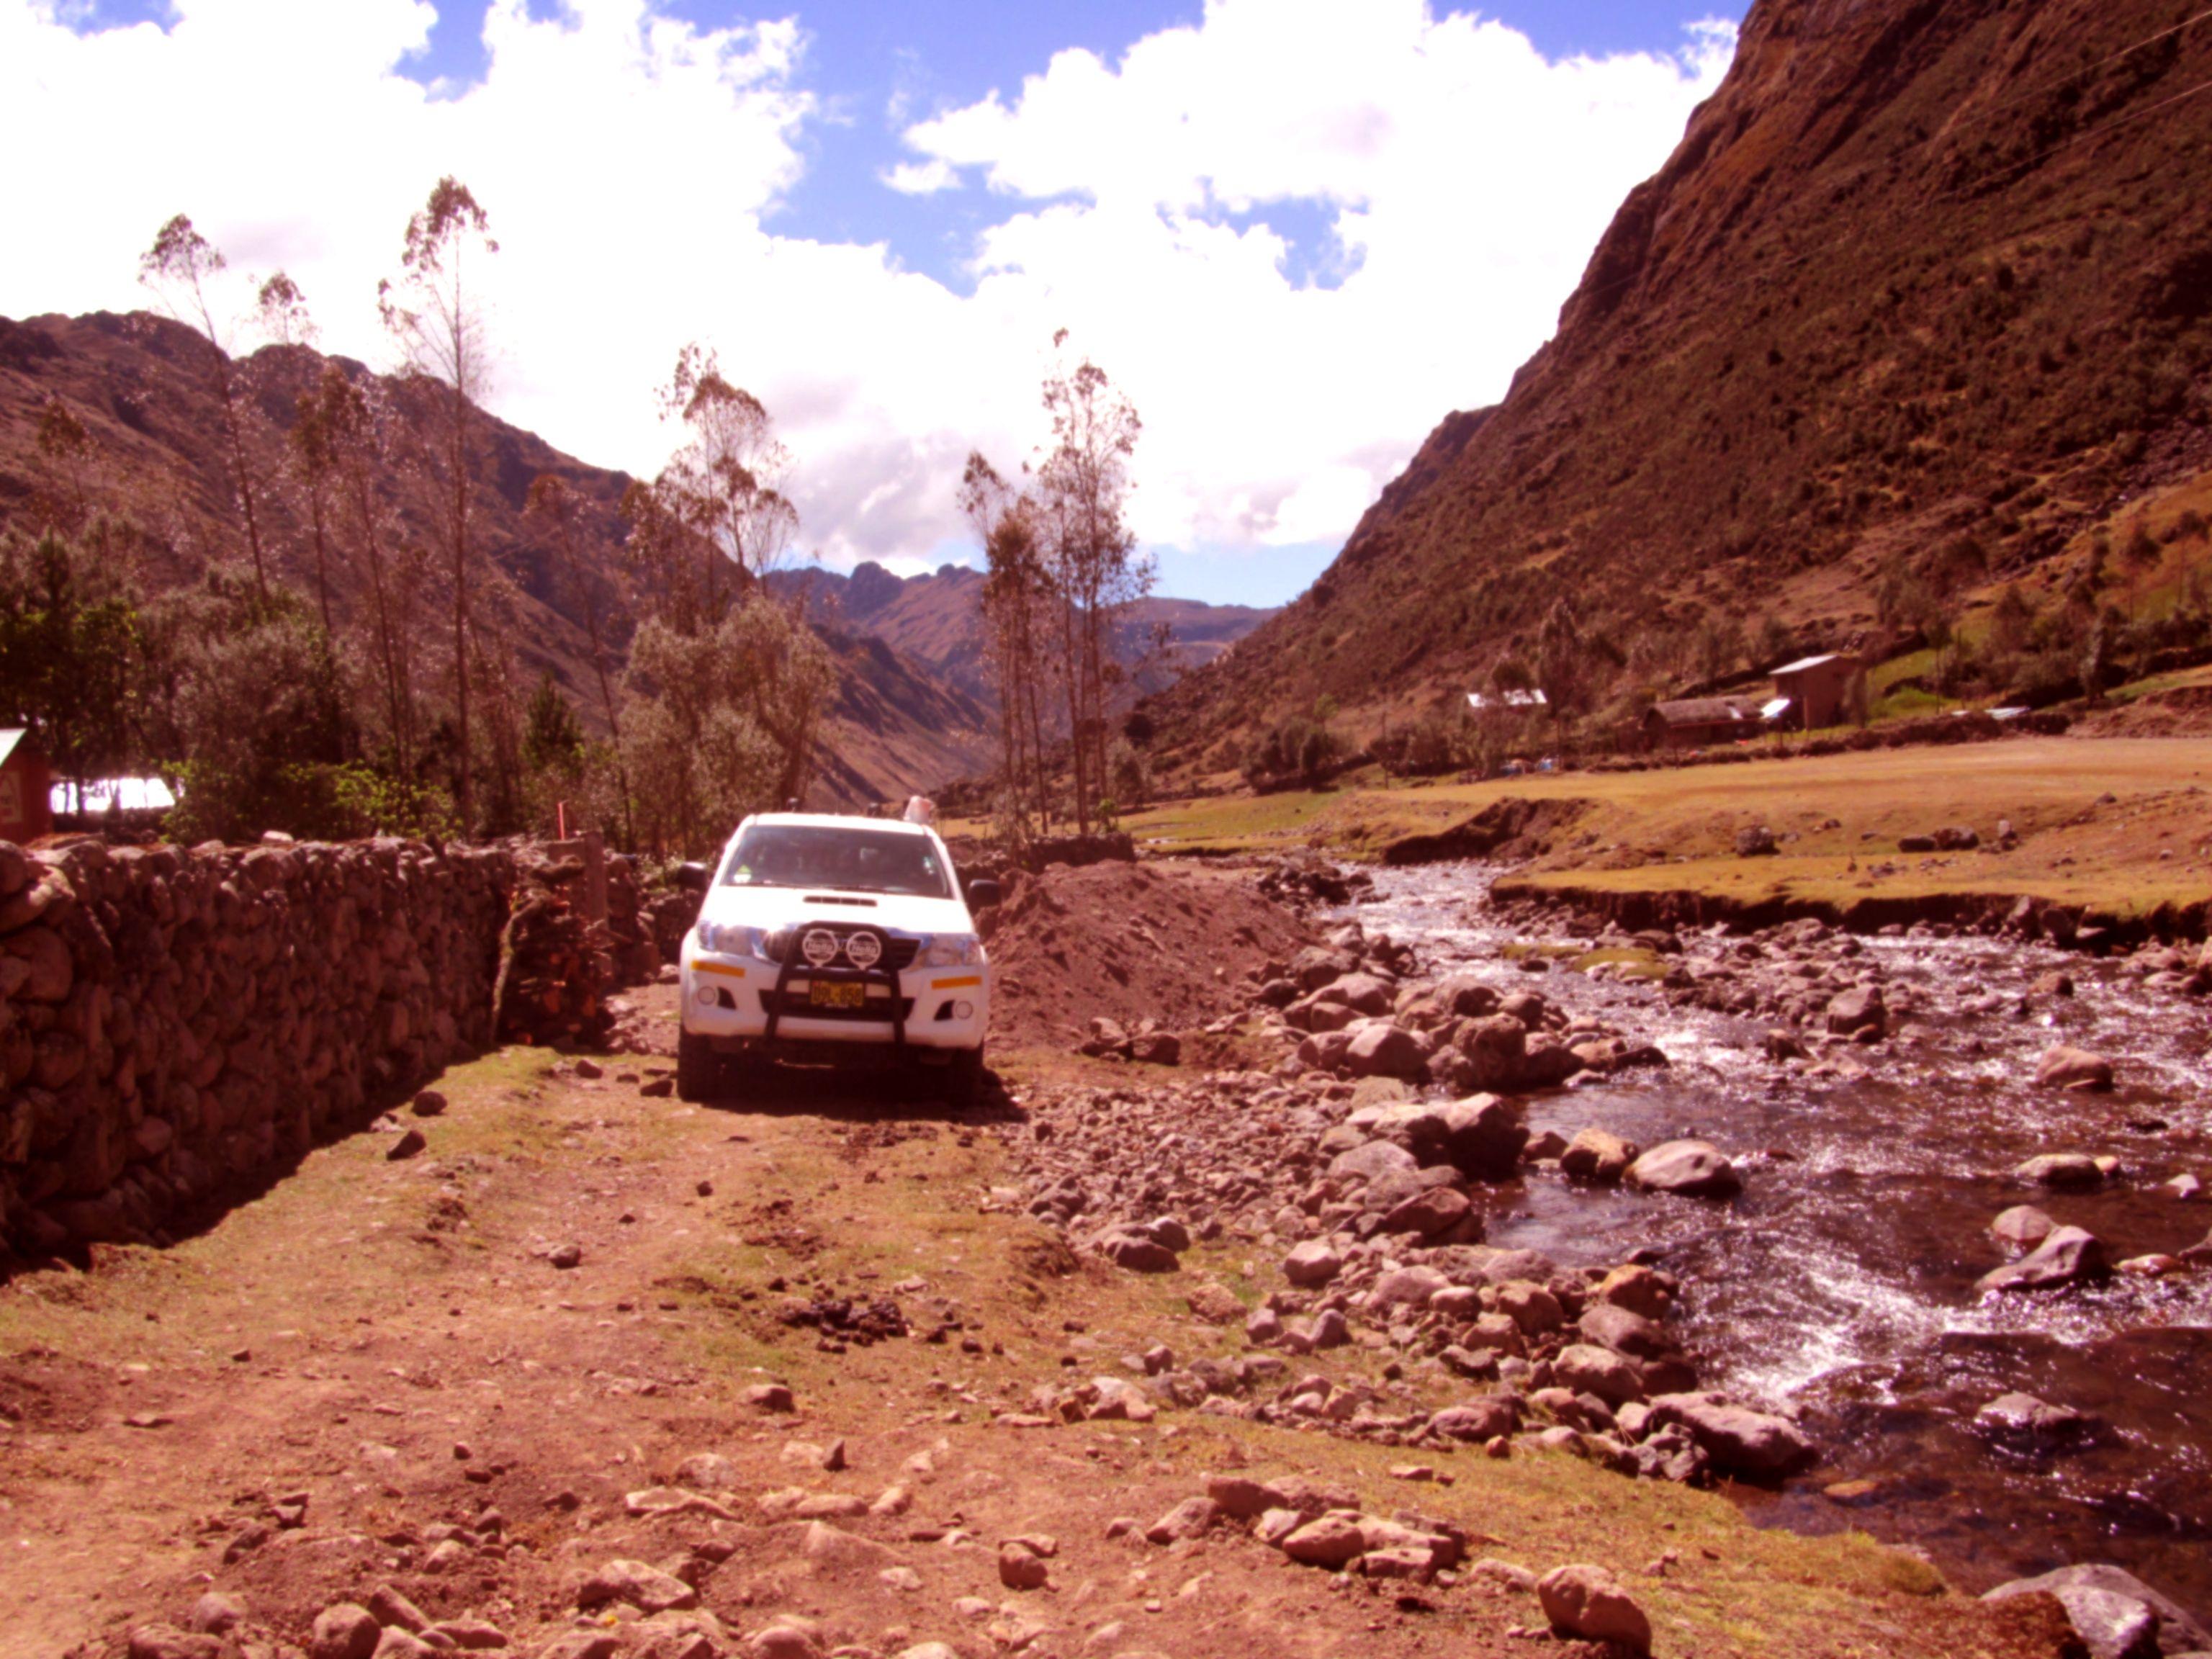 Meet Cusco with Wellas Rent a car. #Cusco #CuscoTravel #Cuzco